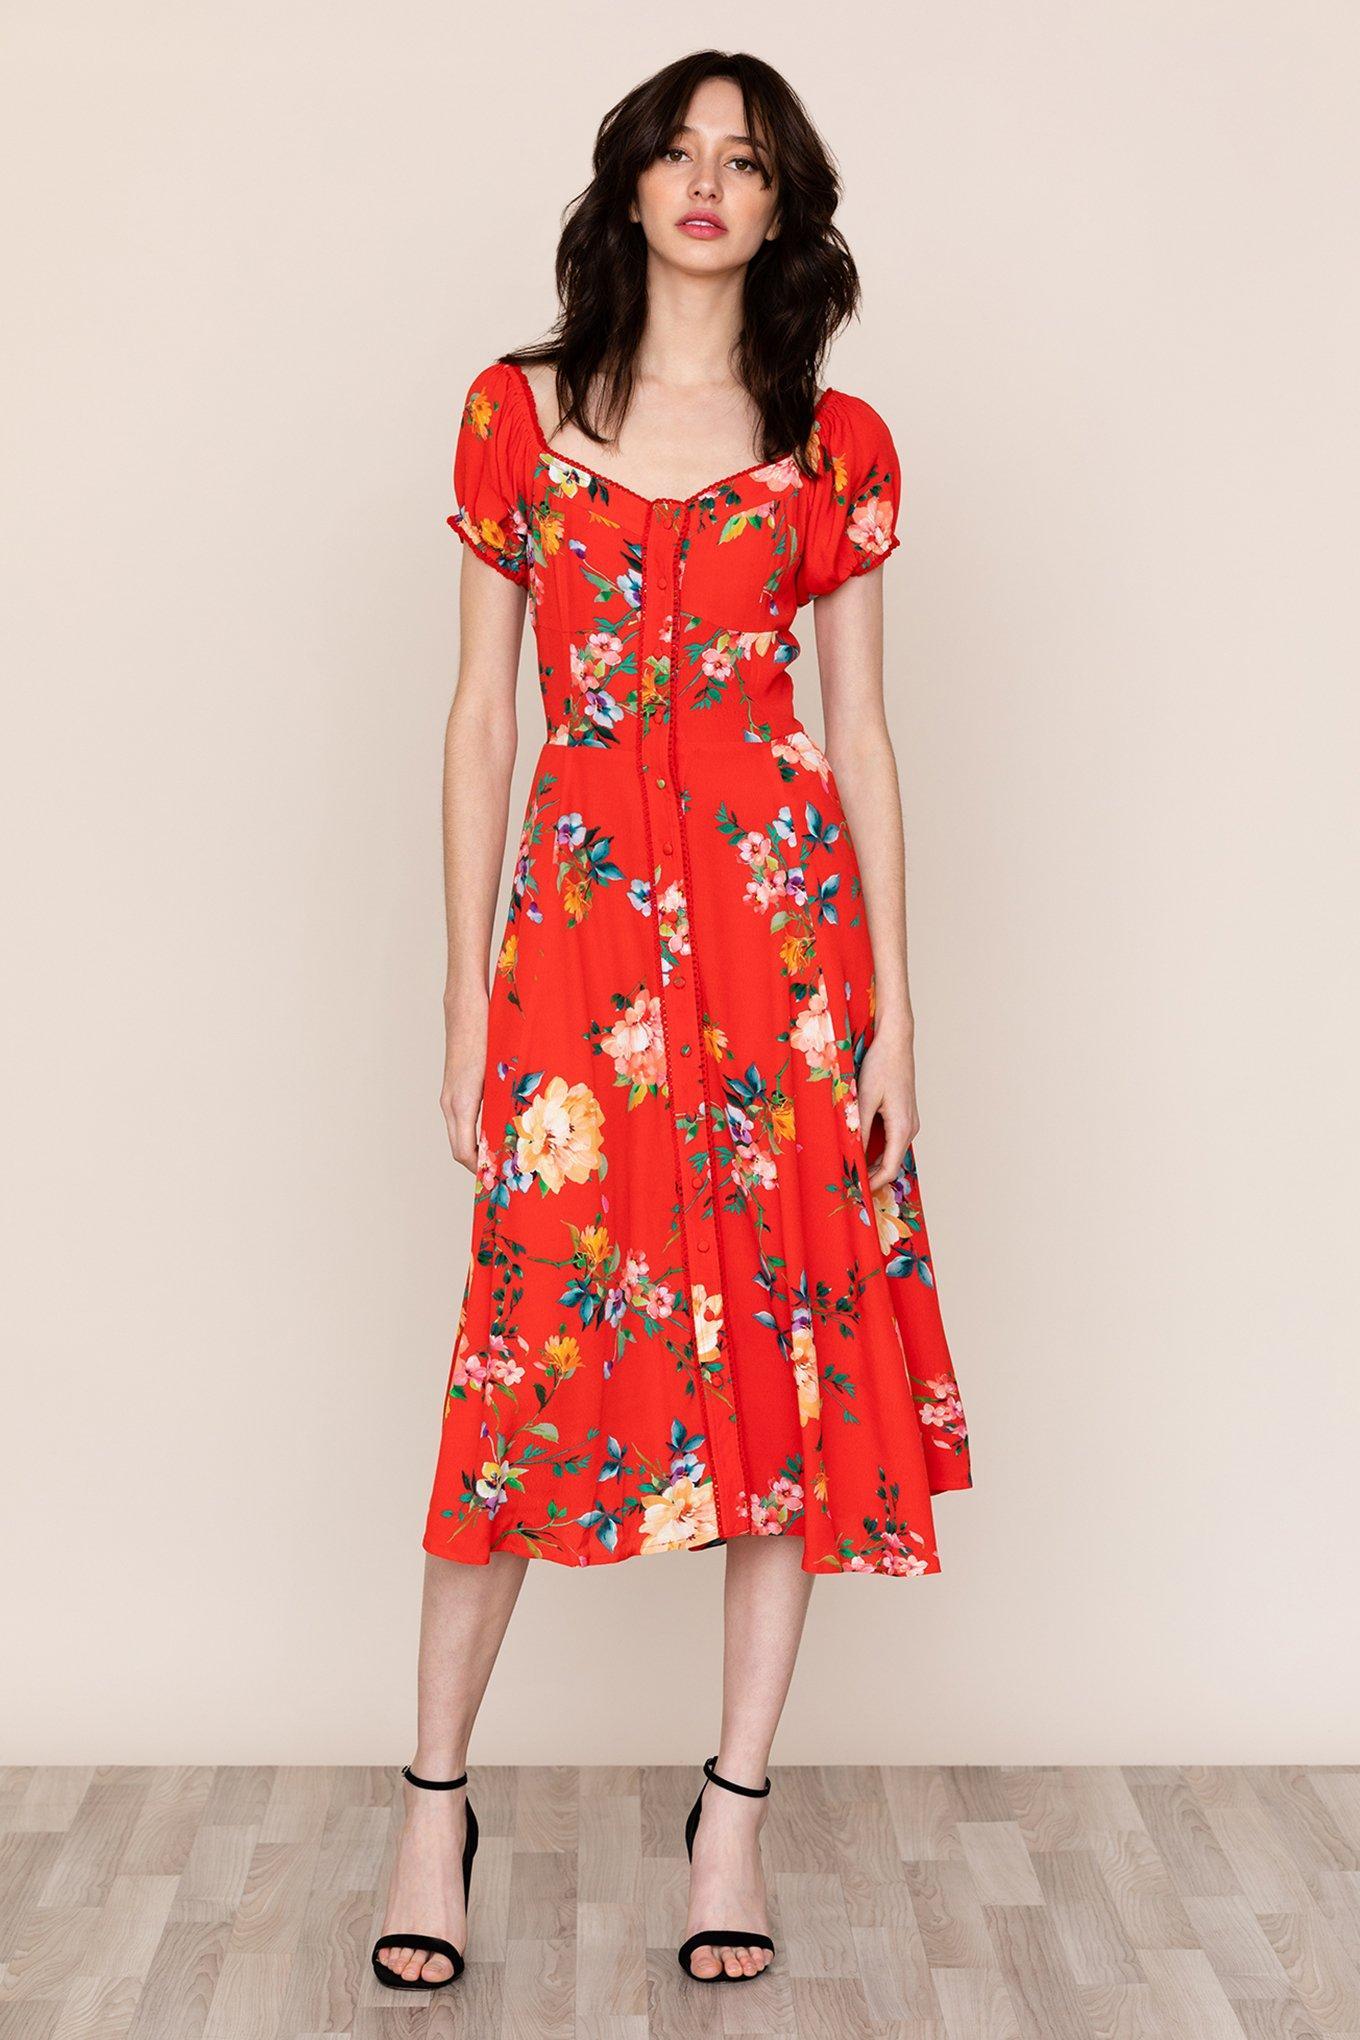 5be0ee6ea123 Yumi Kim Mercer Street Dress in Red - Lyst